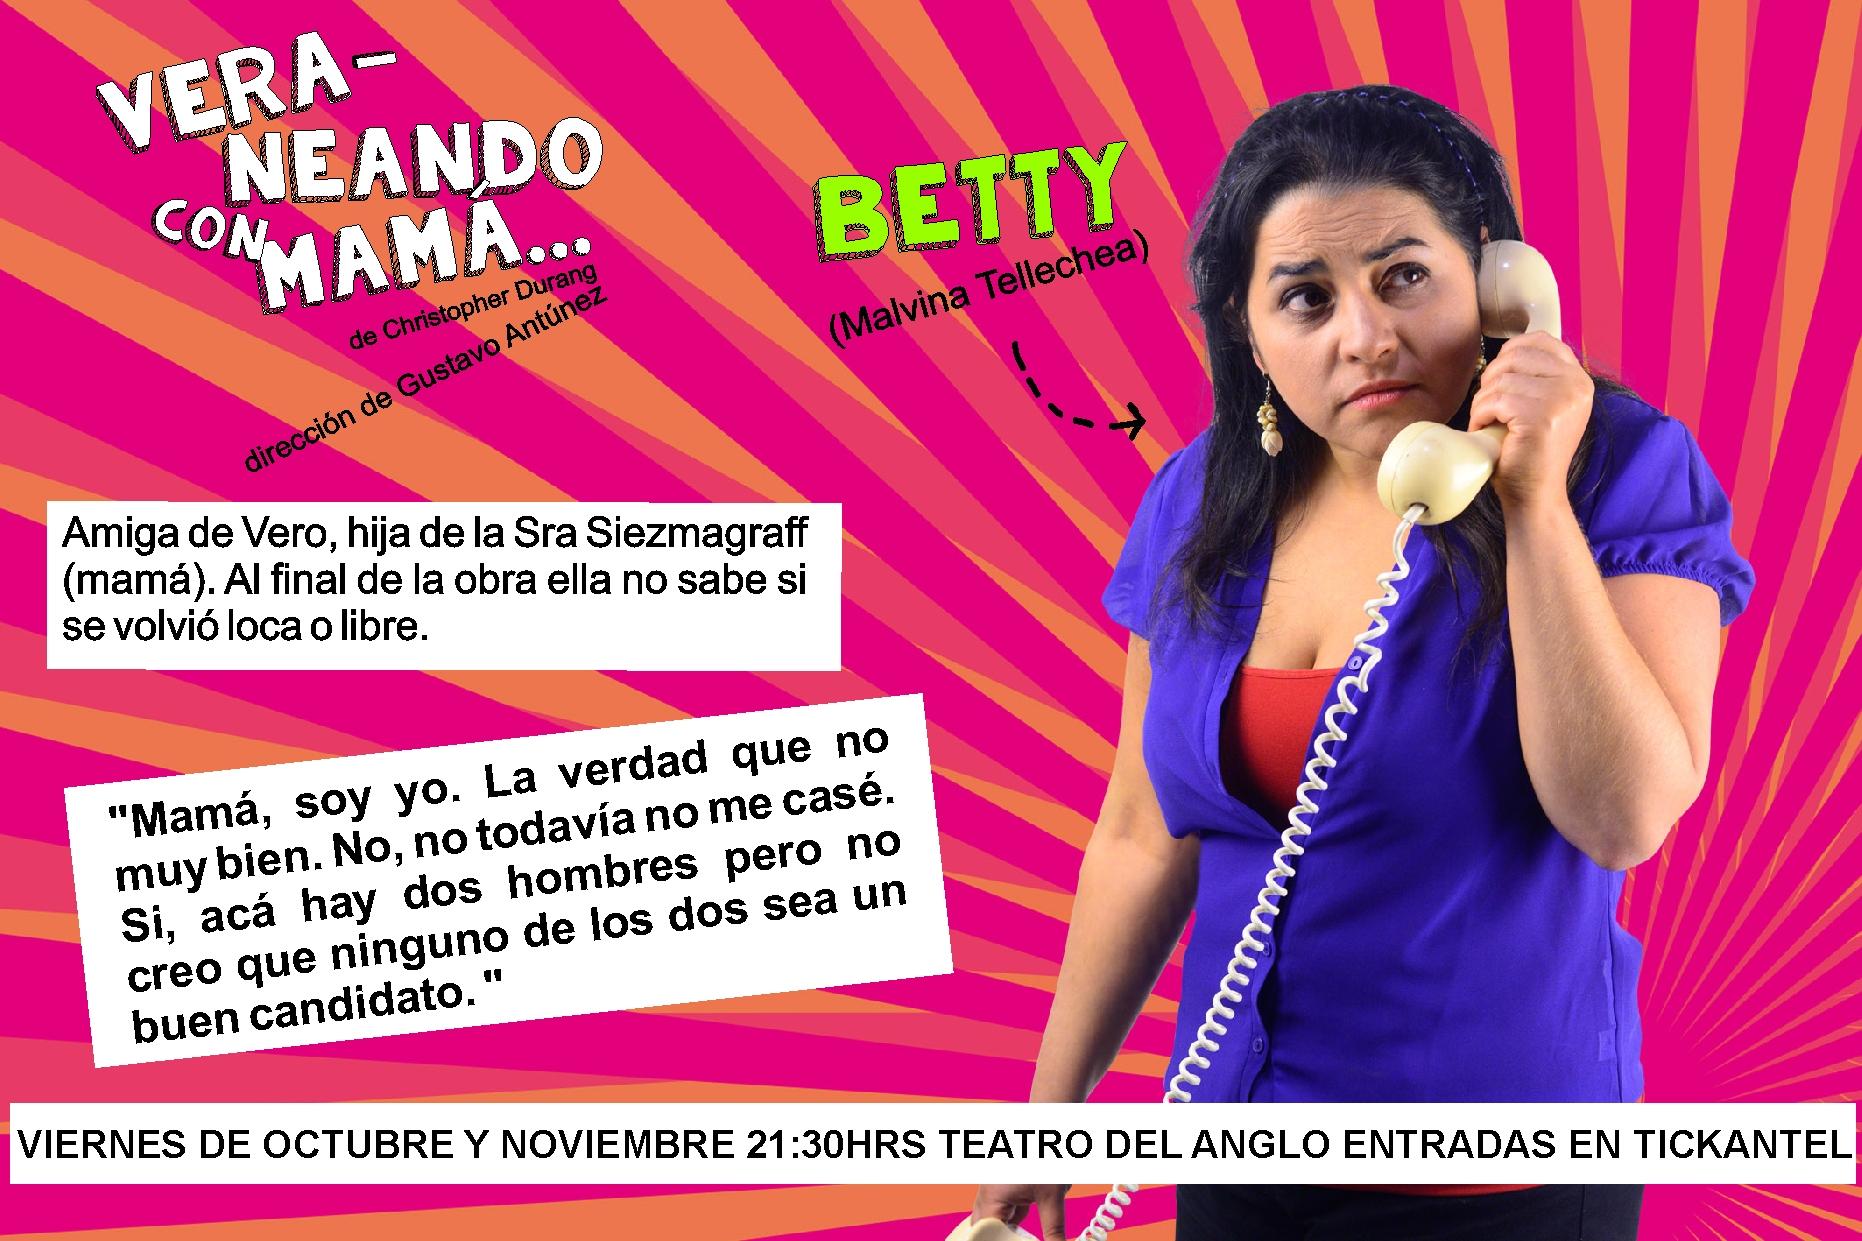 Betty promo